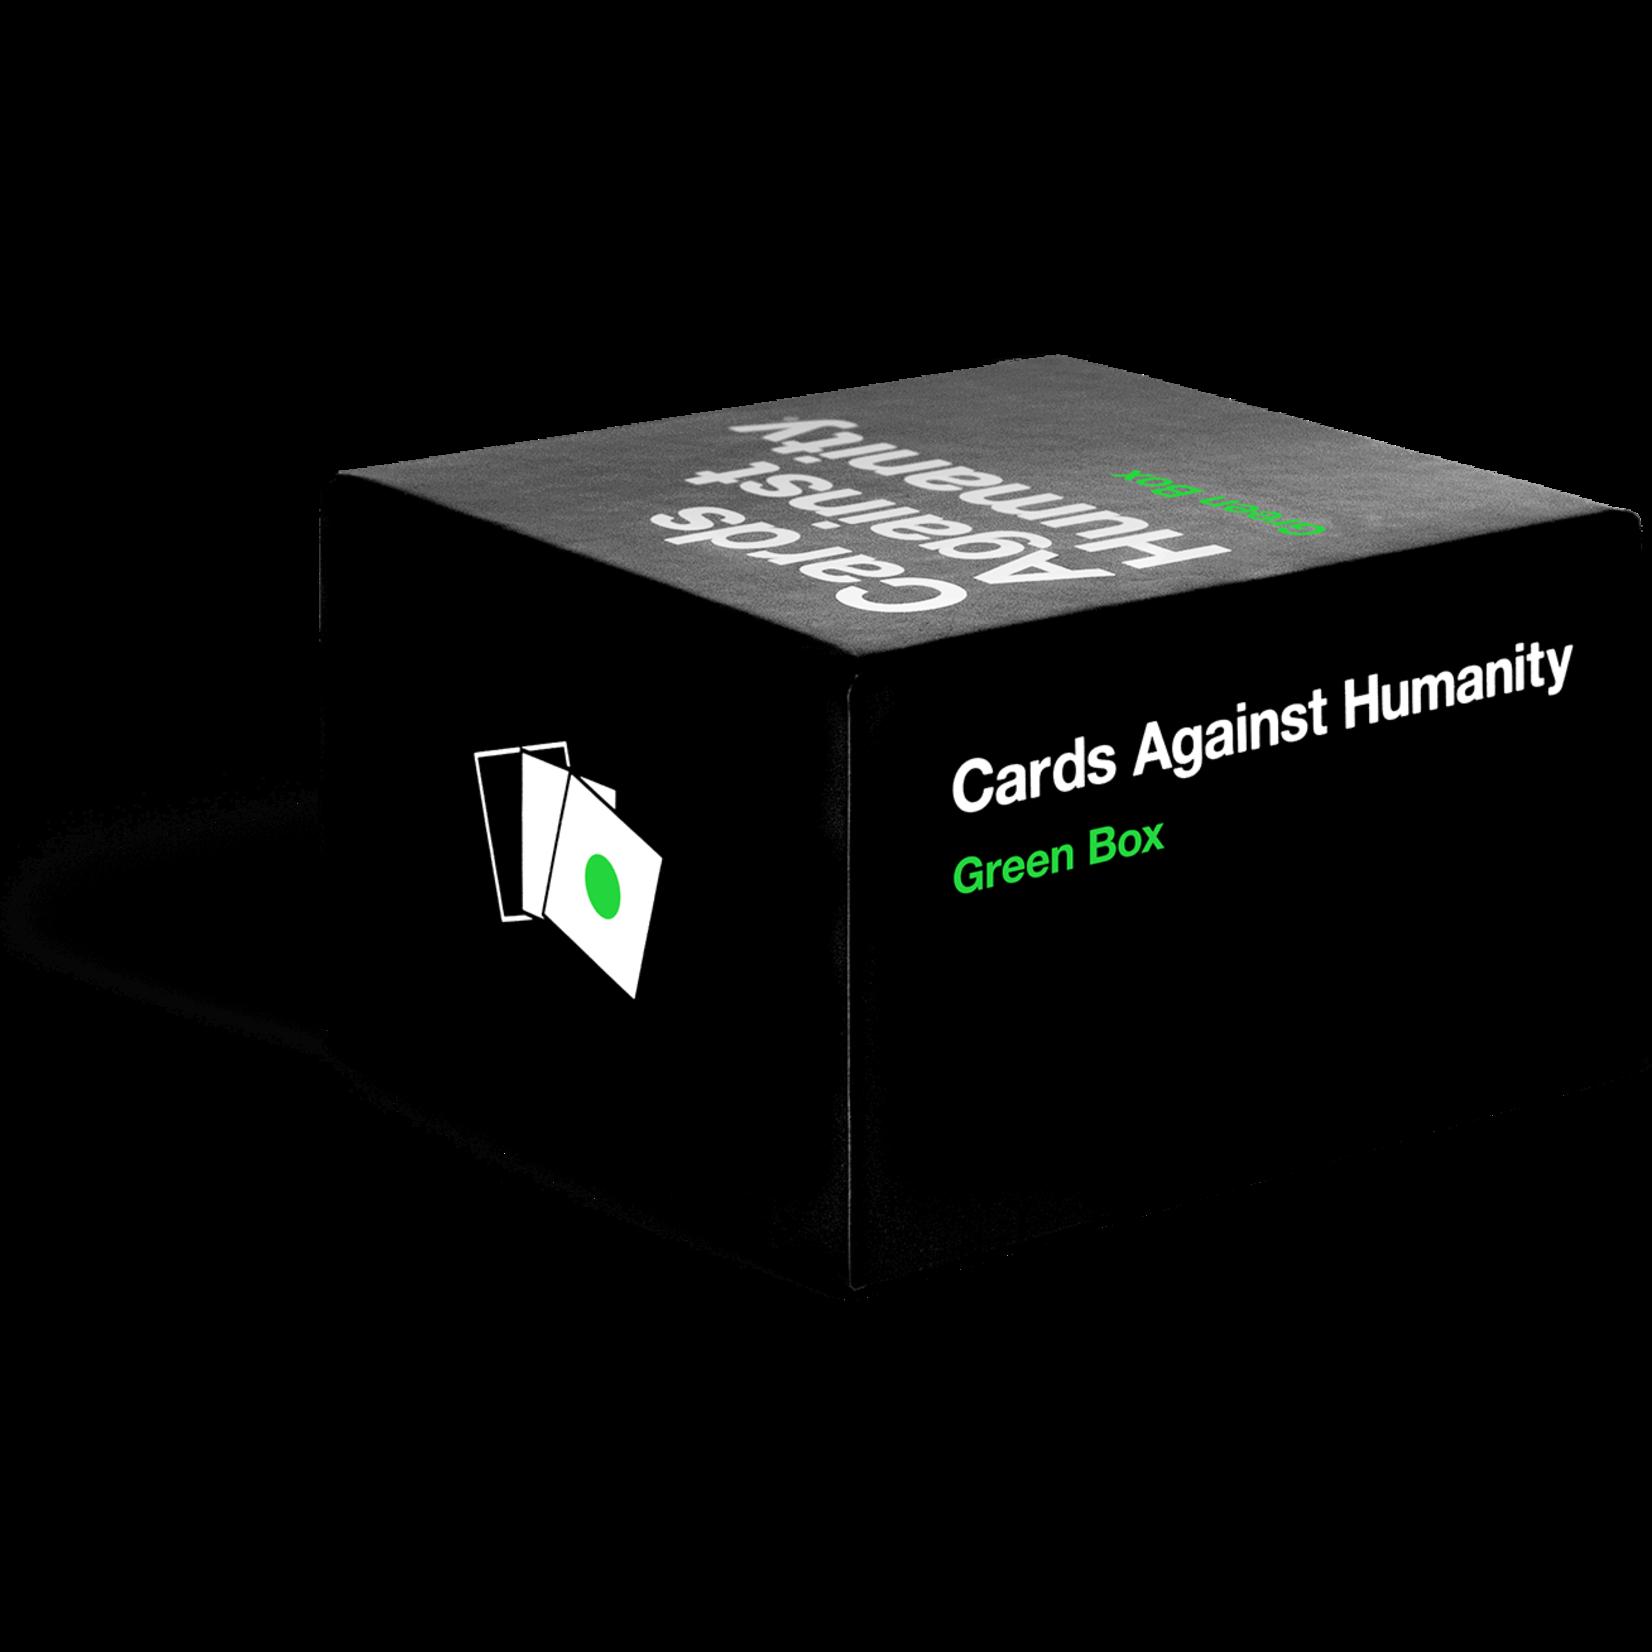 Cards Against Humanity Cards Against Humanity: Green Box